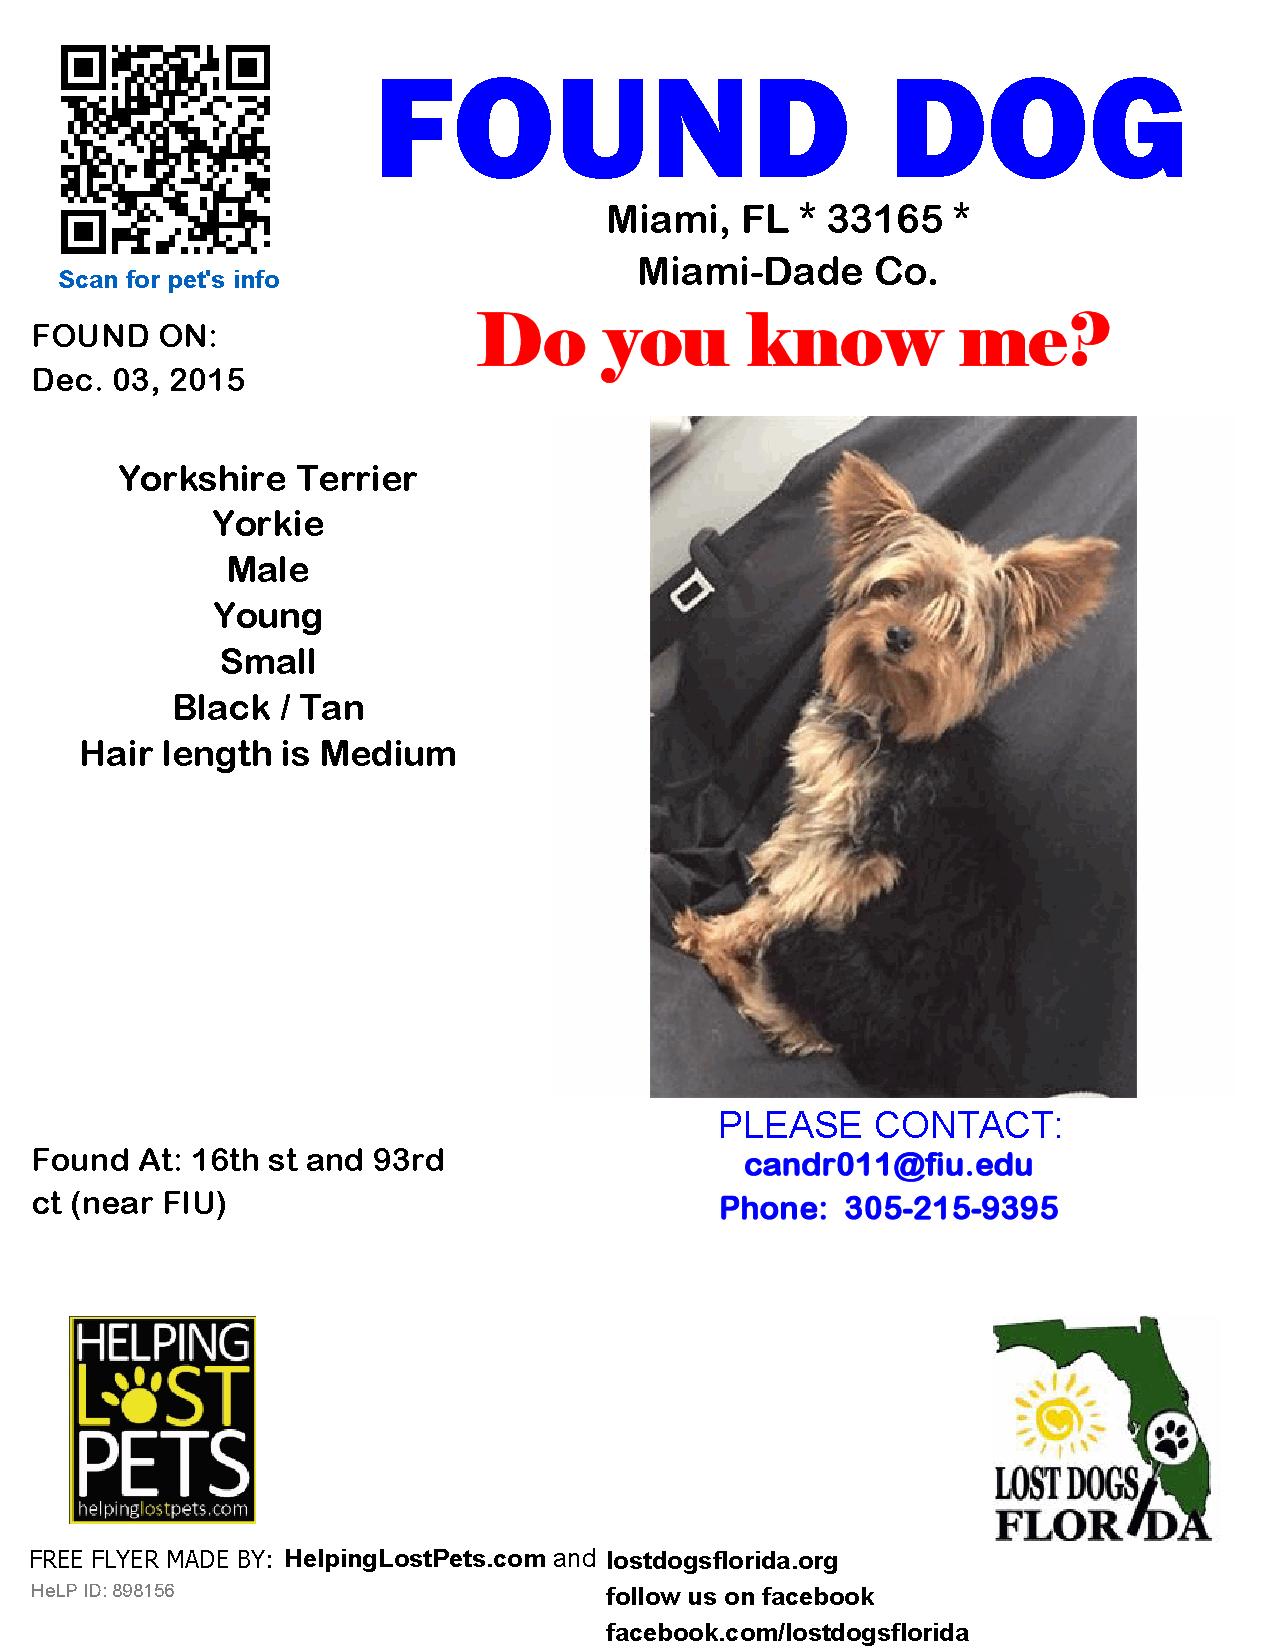 Found Dog - Yorkshire Terrier Yorkie - Miami, FL, United States